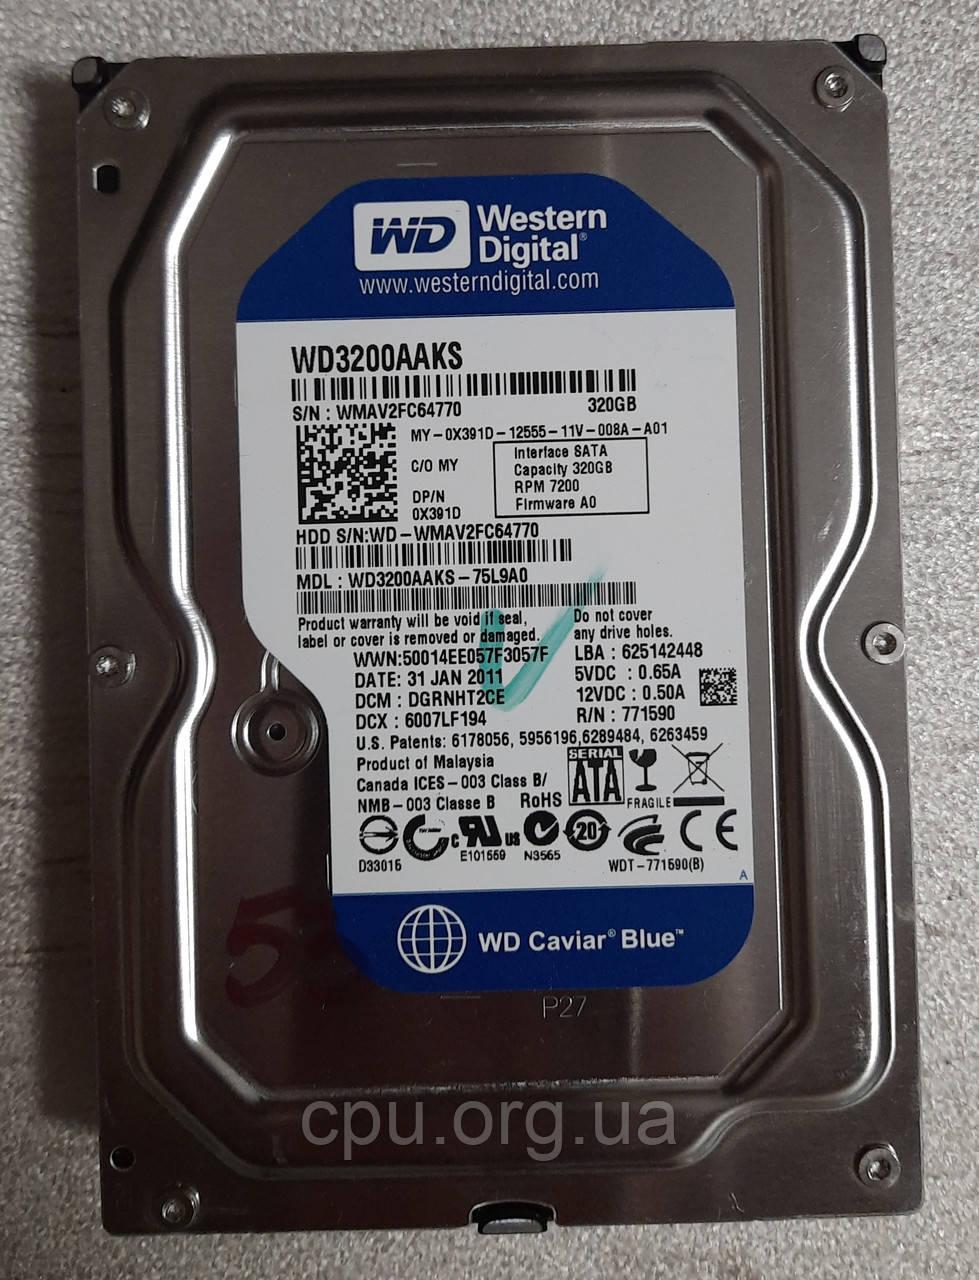 Жесткий диск HDD 3.5 320GB WD WD3200AAKS 16M 7200 об/мин